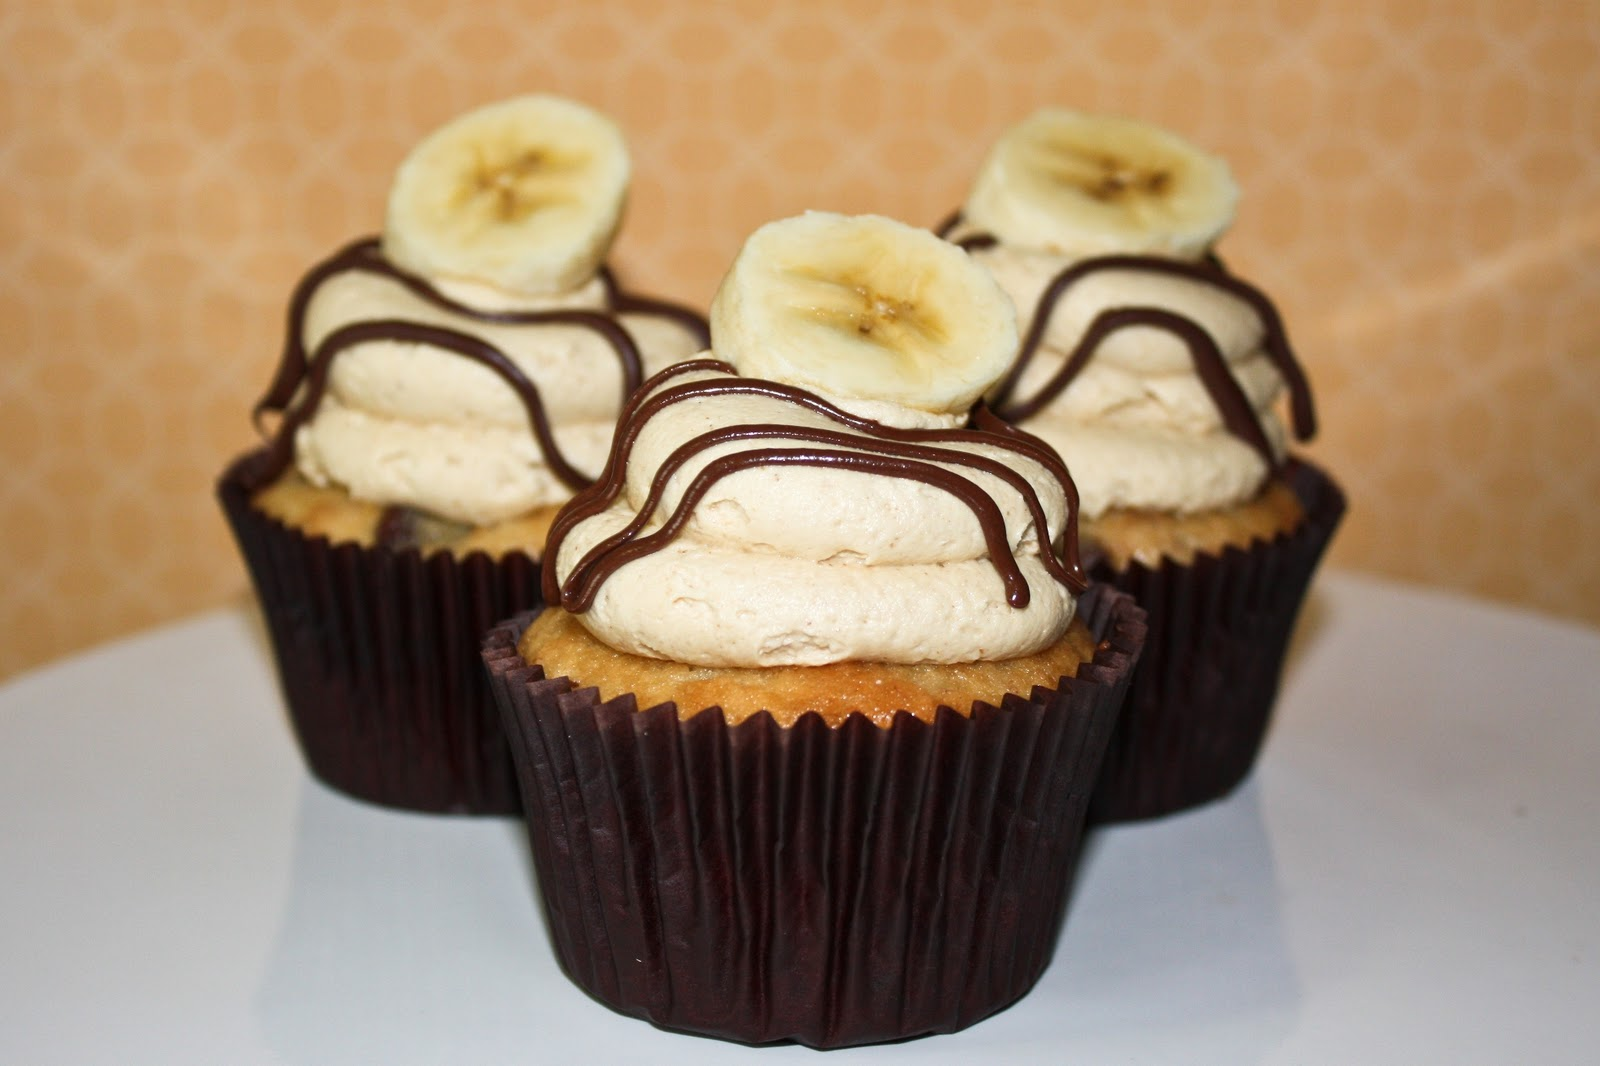 ... chocolate cupcake recipe Java Cupcake peanut butter frosting